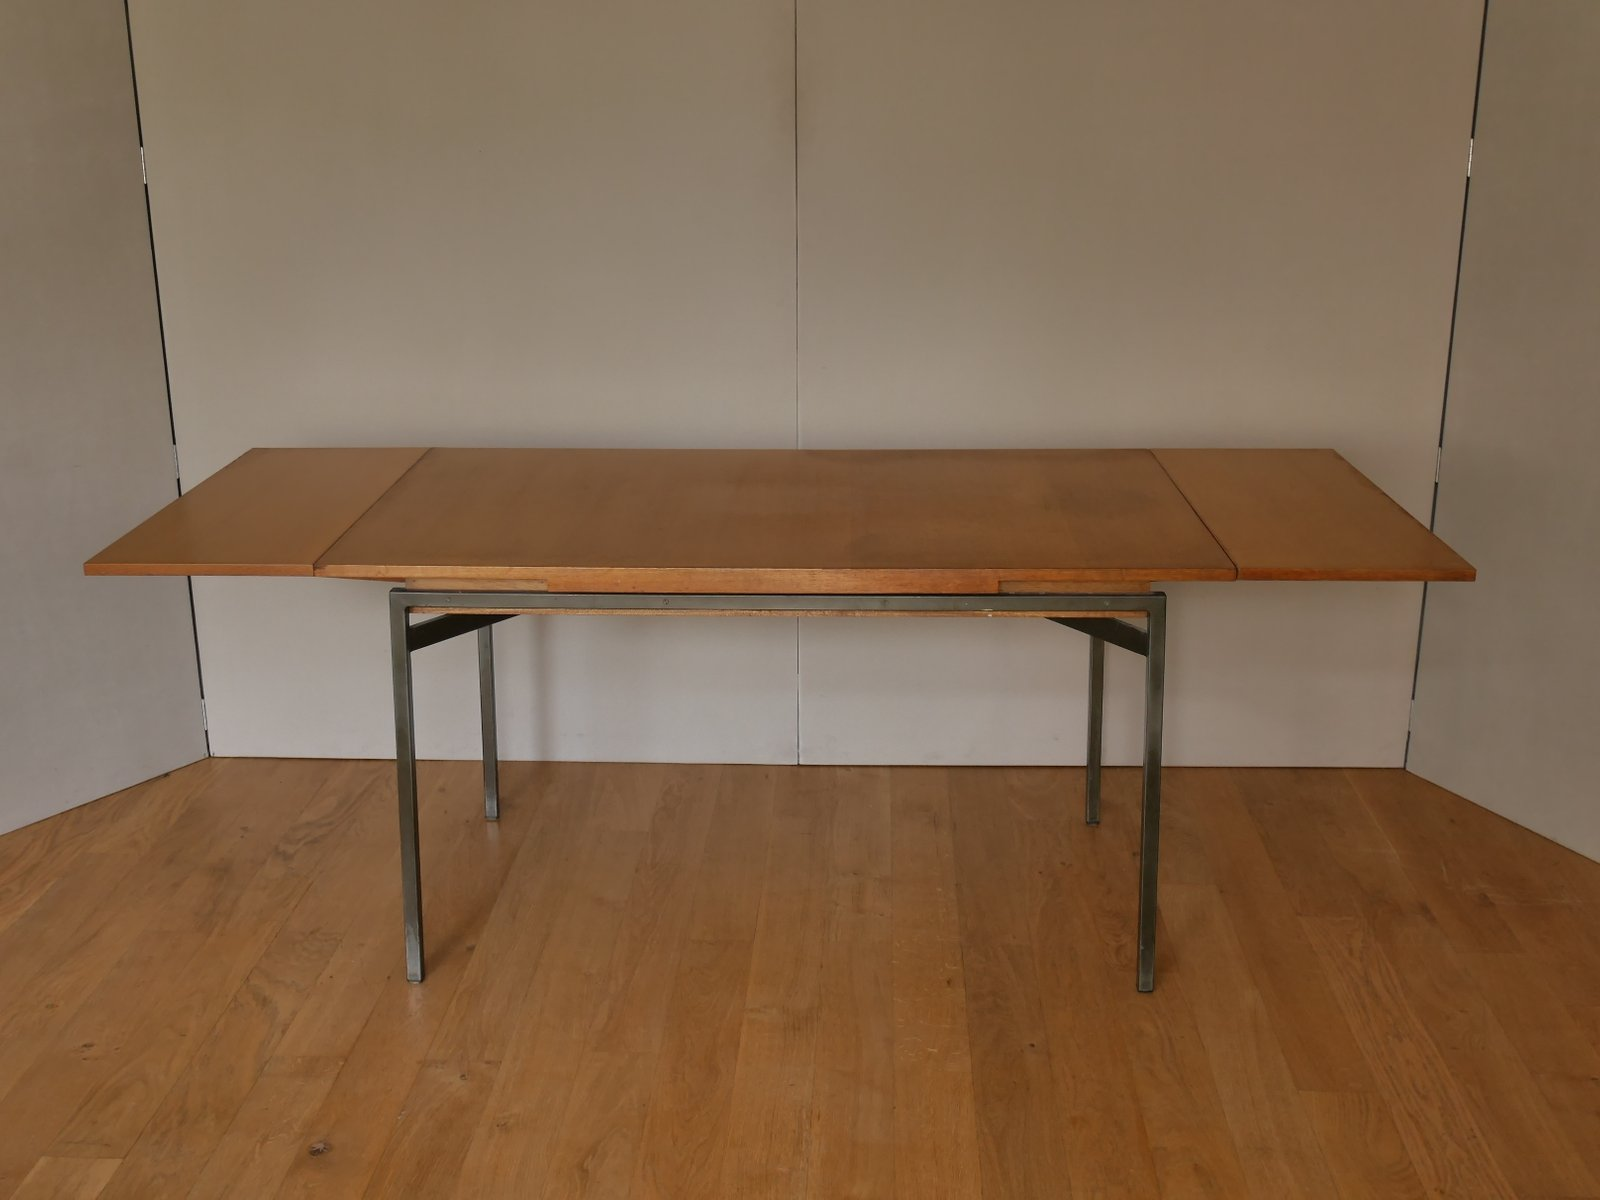 Extendable Dining Table By Bernard Marange For Meubles Polyvalents, 1950S